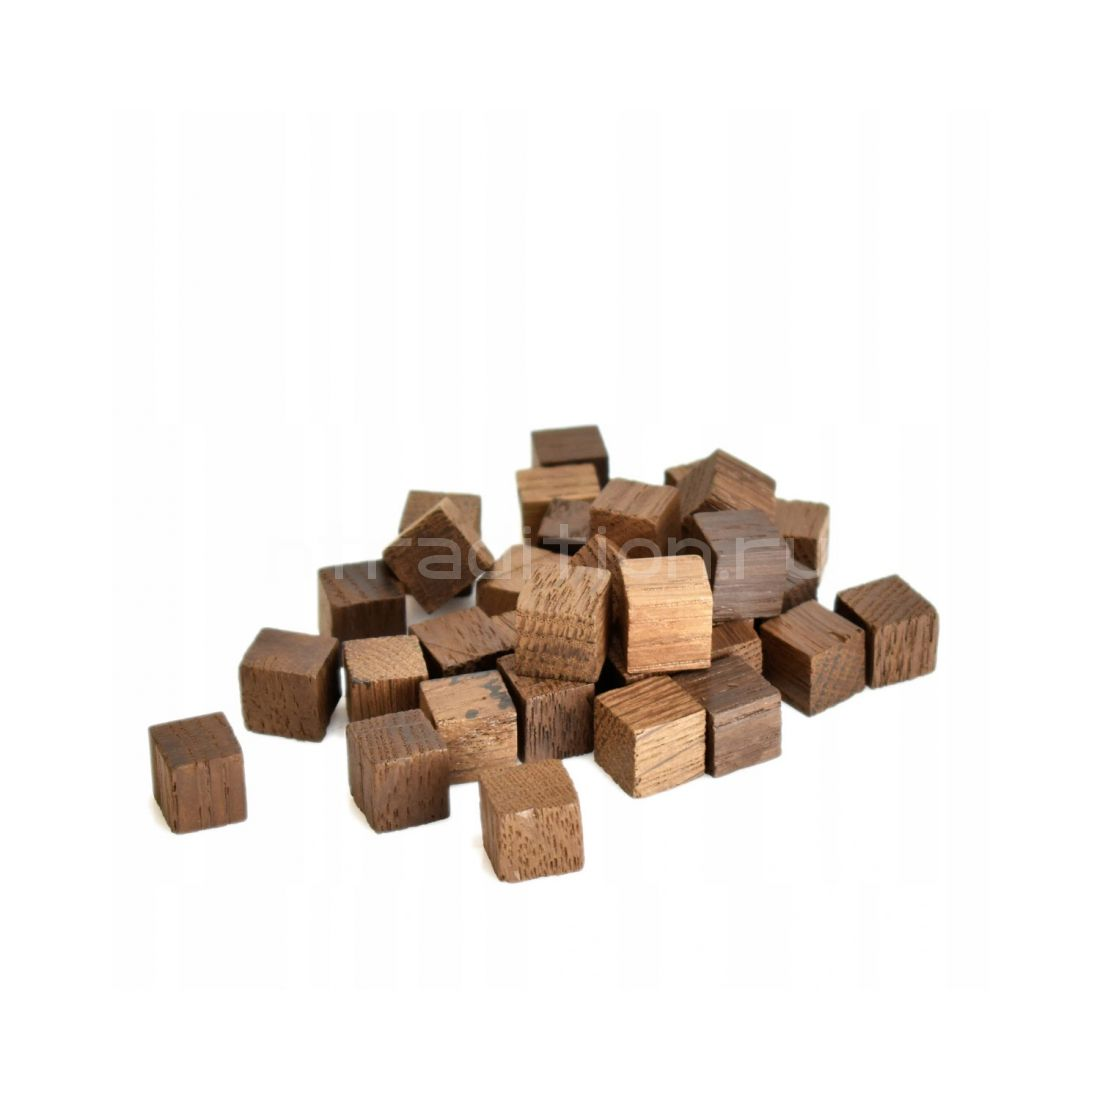 Кубики «Эксклюзив» из дерева Вишни, средний обжиг, 50 гр. (Сербия)